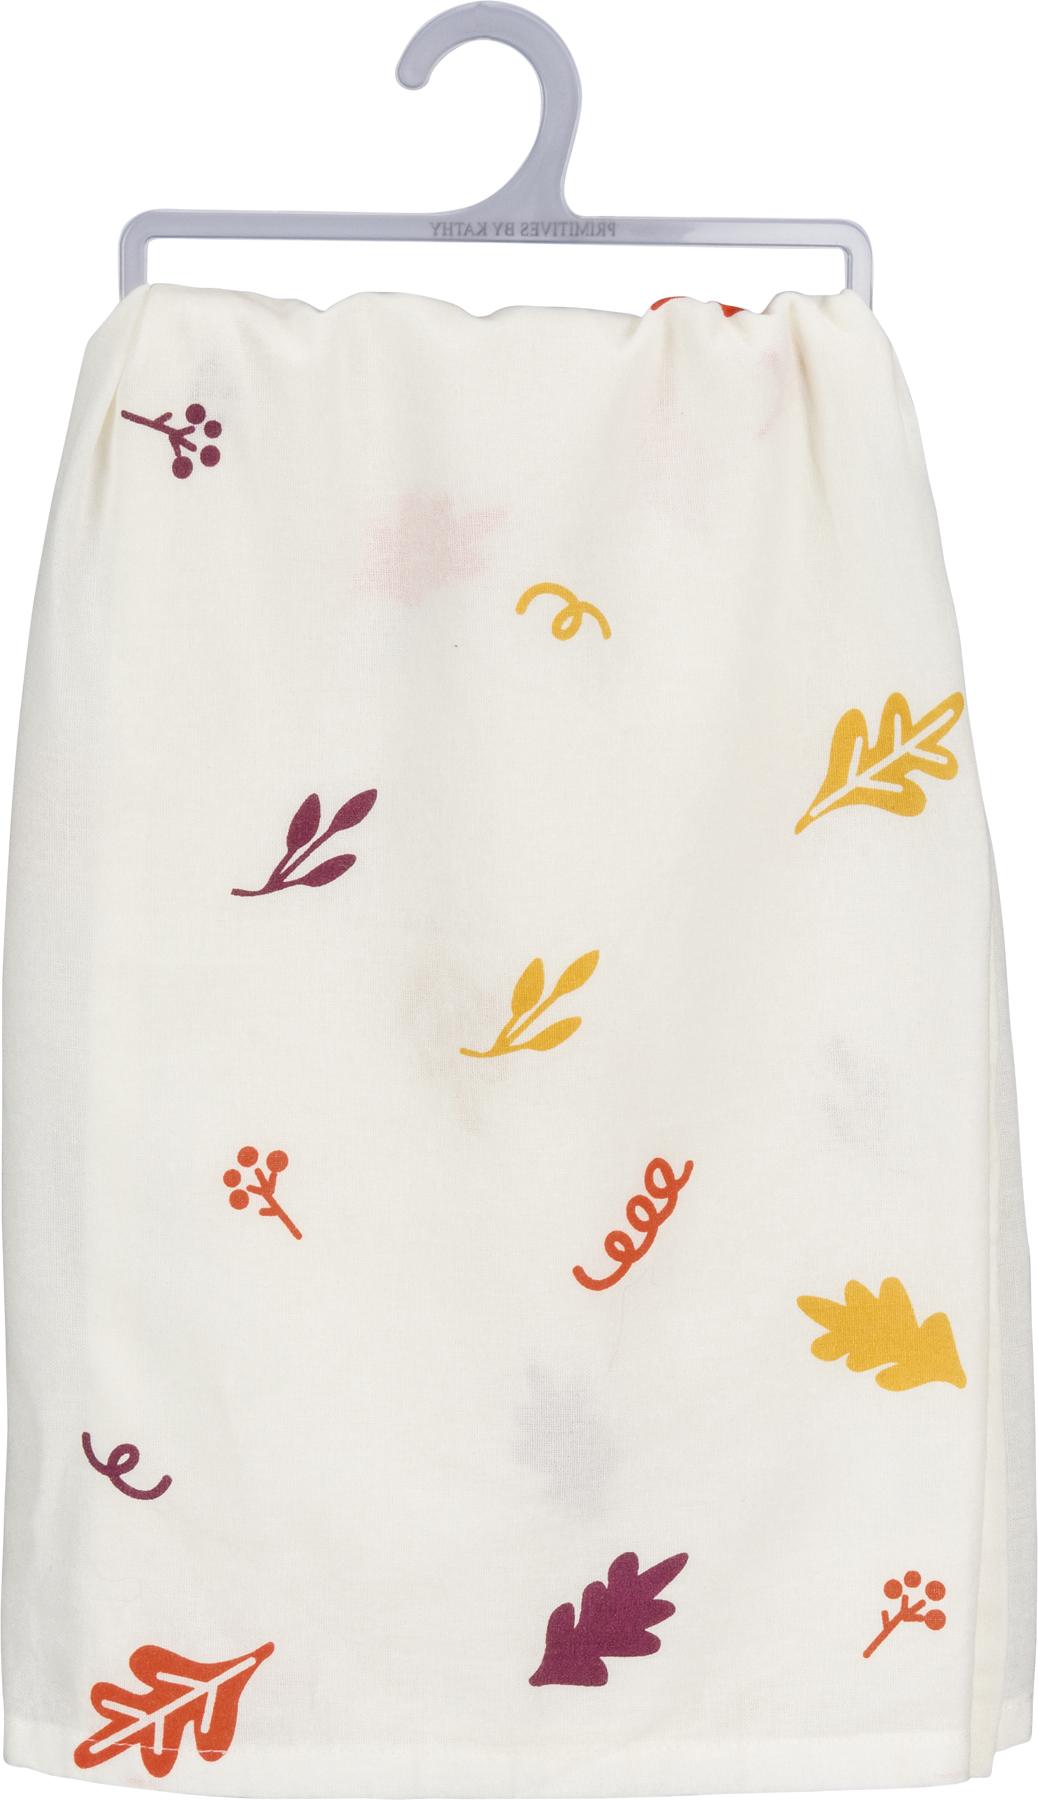 Happy Fall Yall Tea Towel